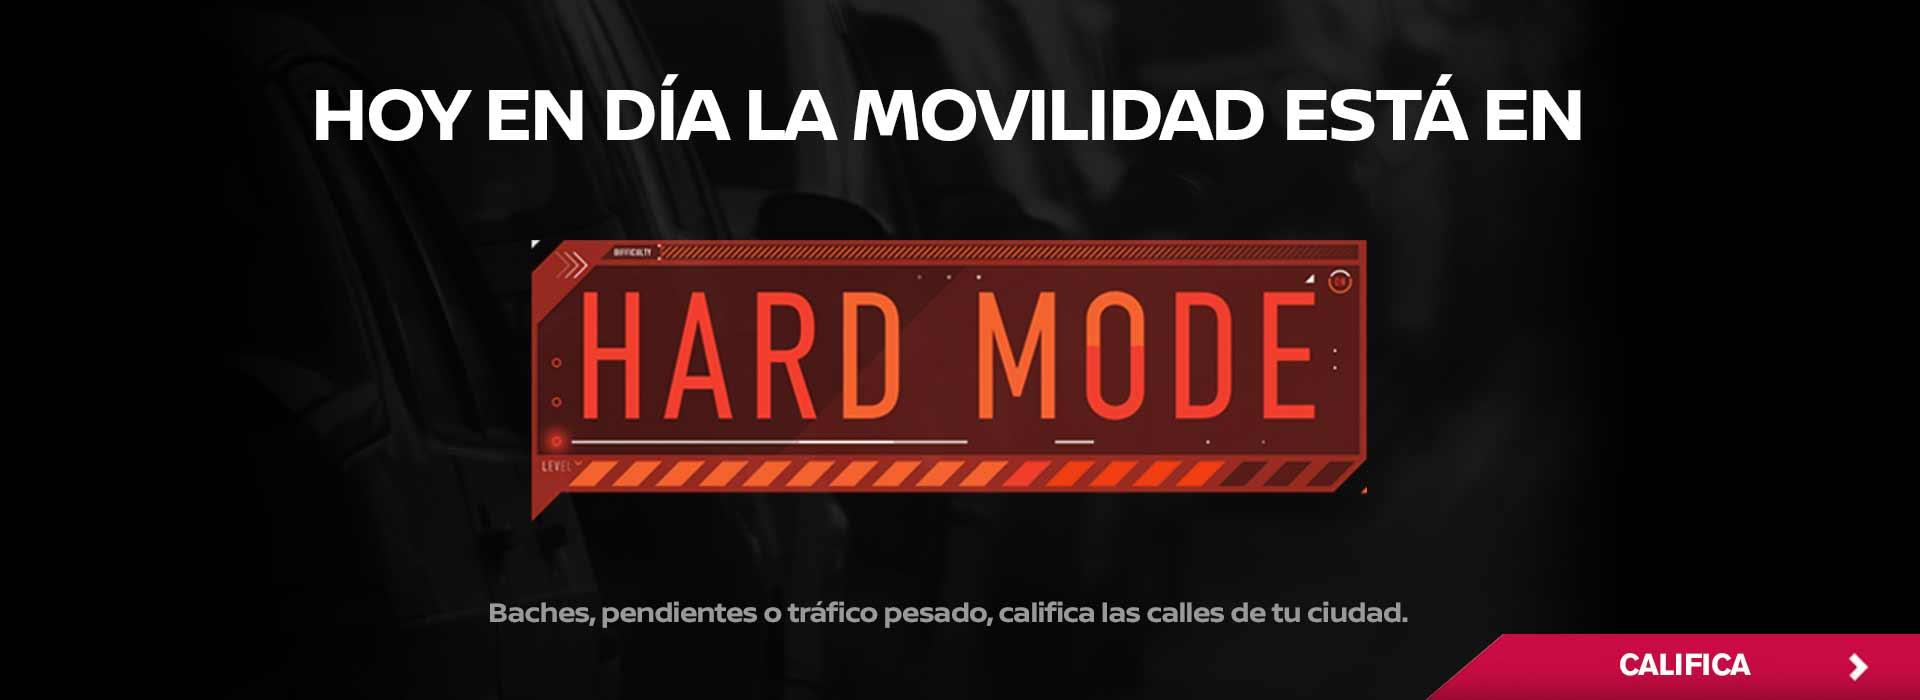 #HardMode